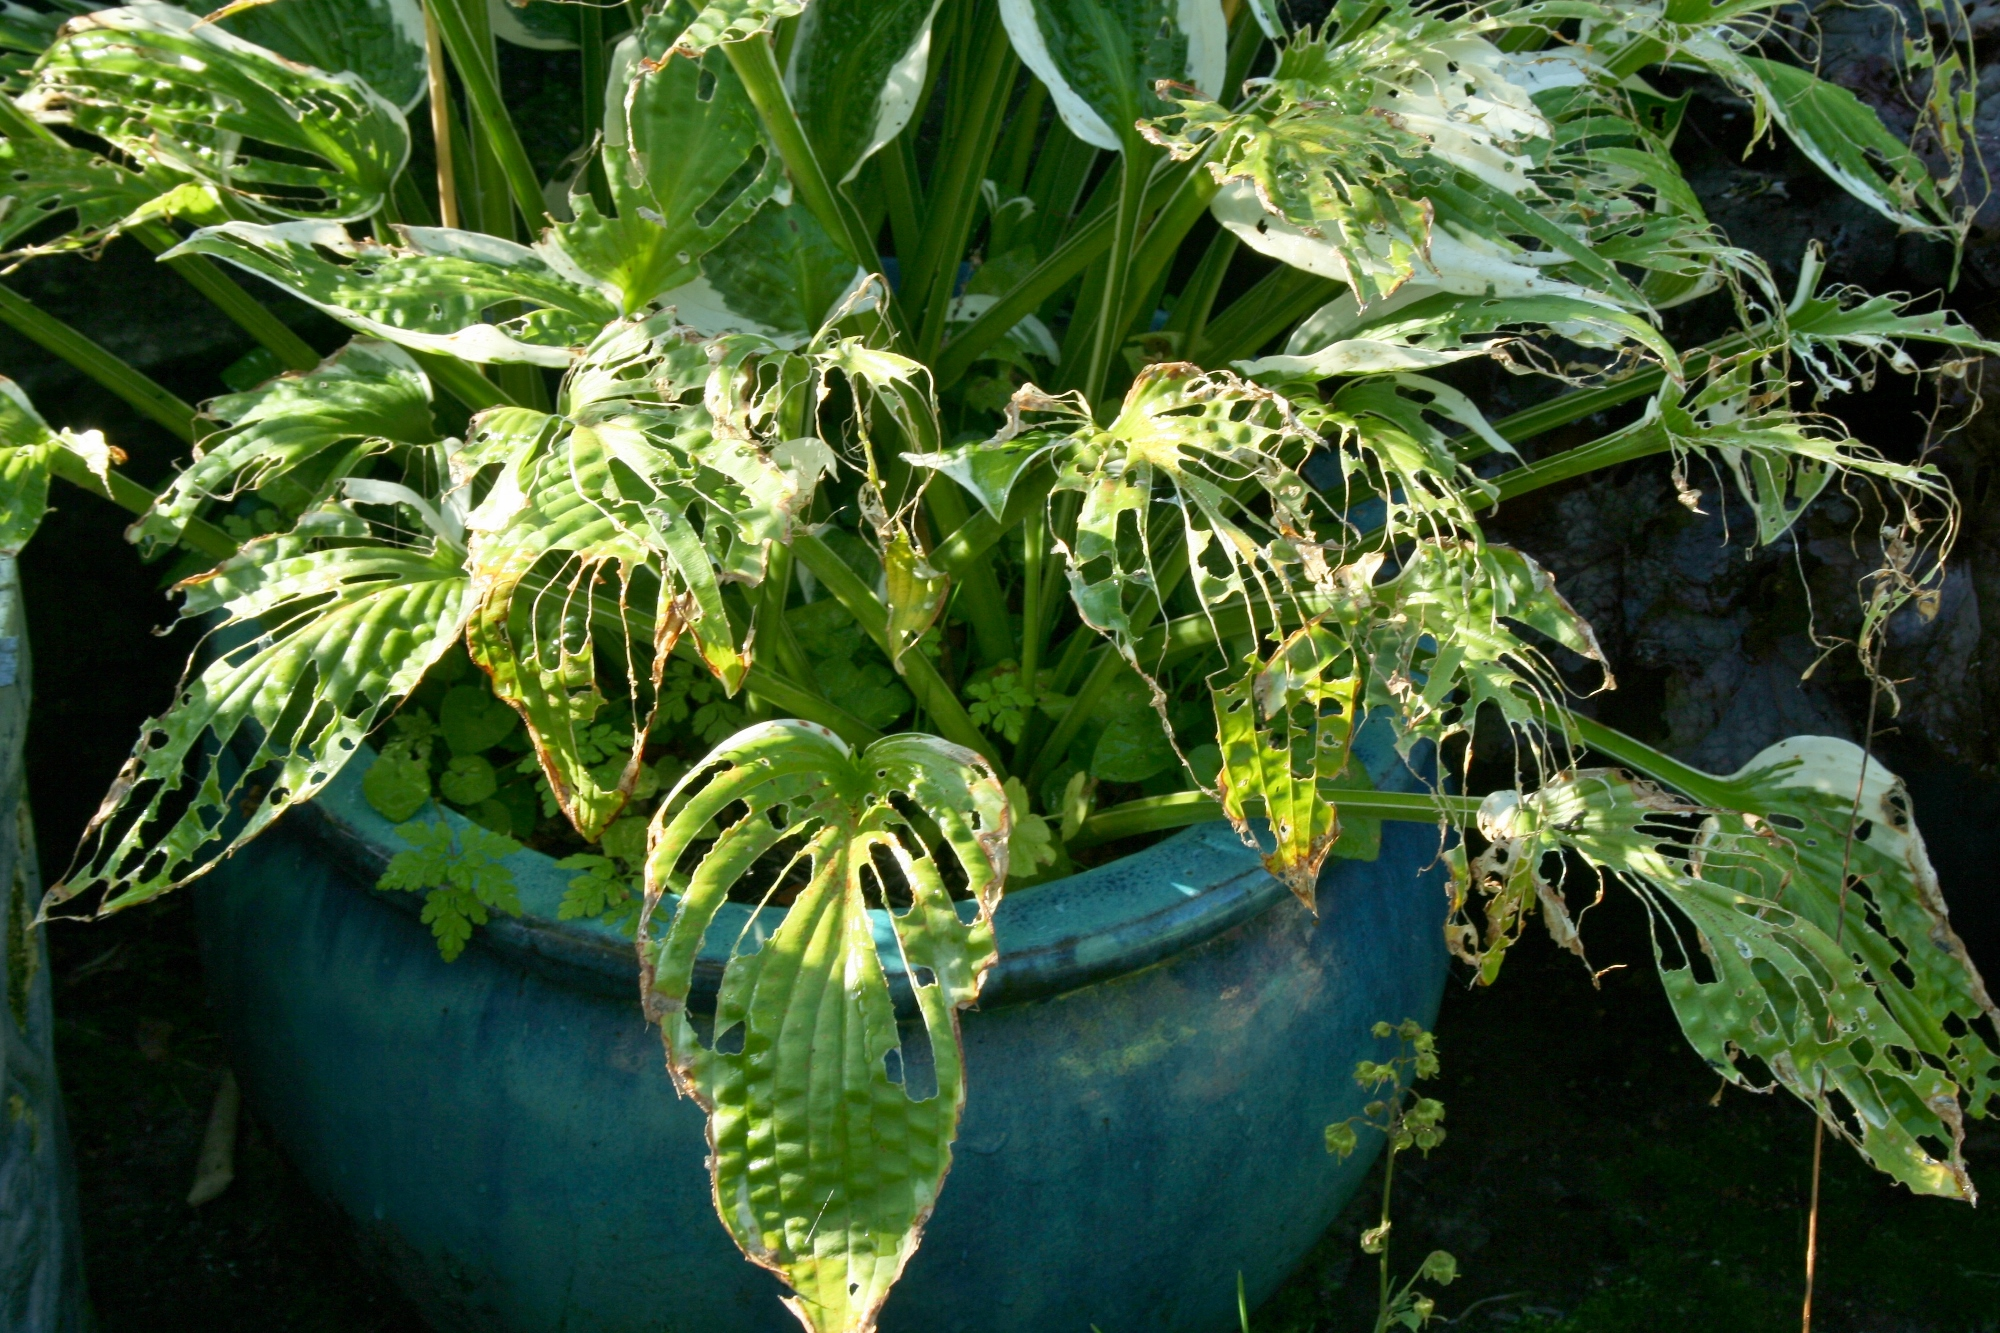 How To Control Slugs Organically Garden World